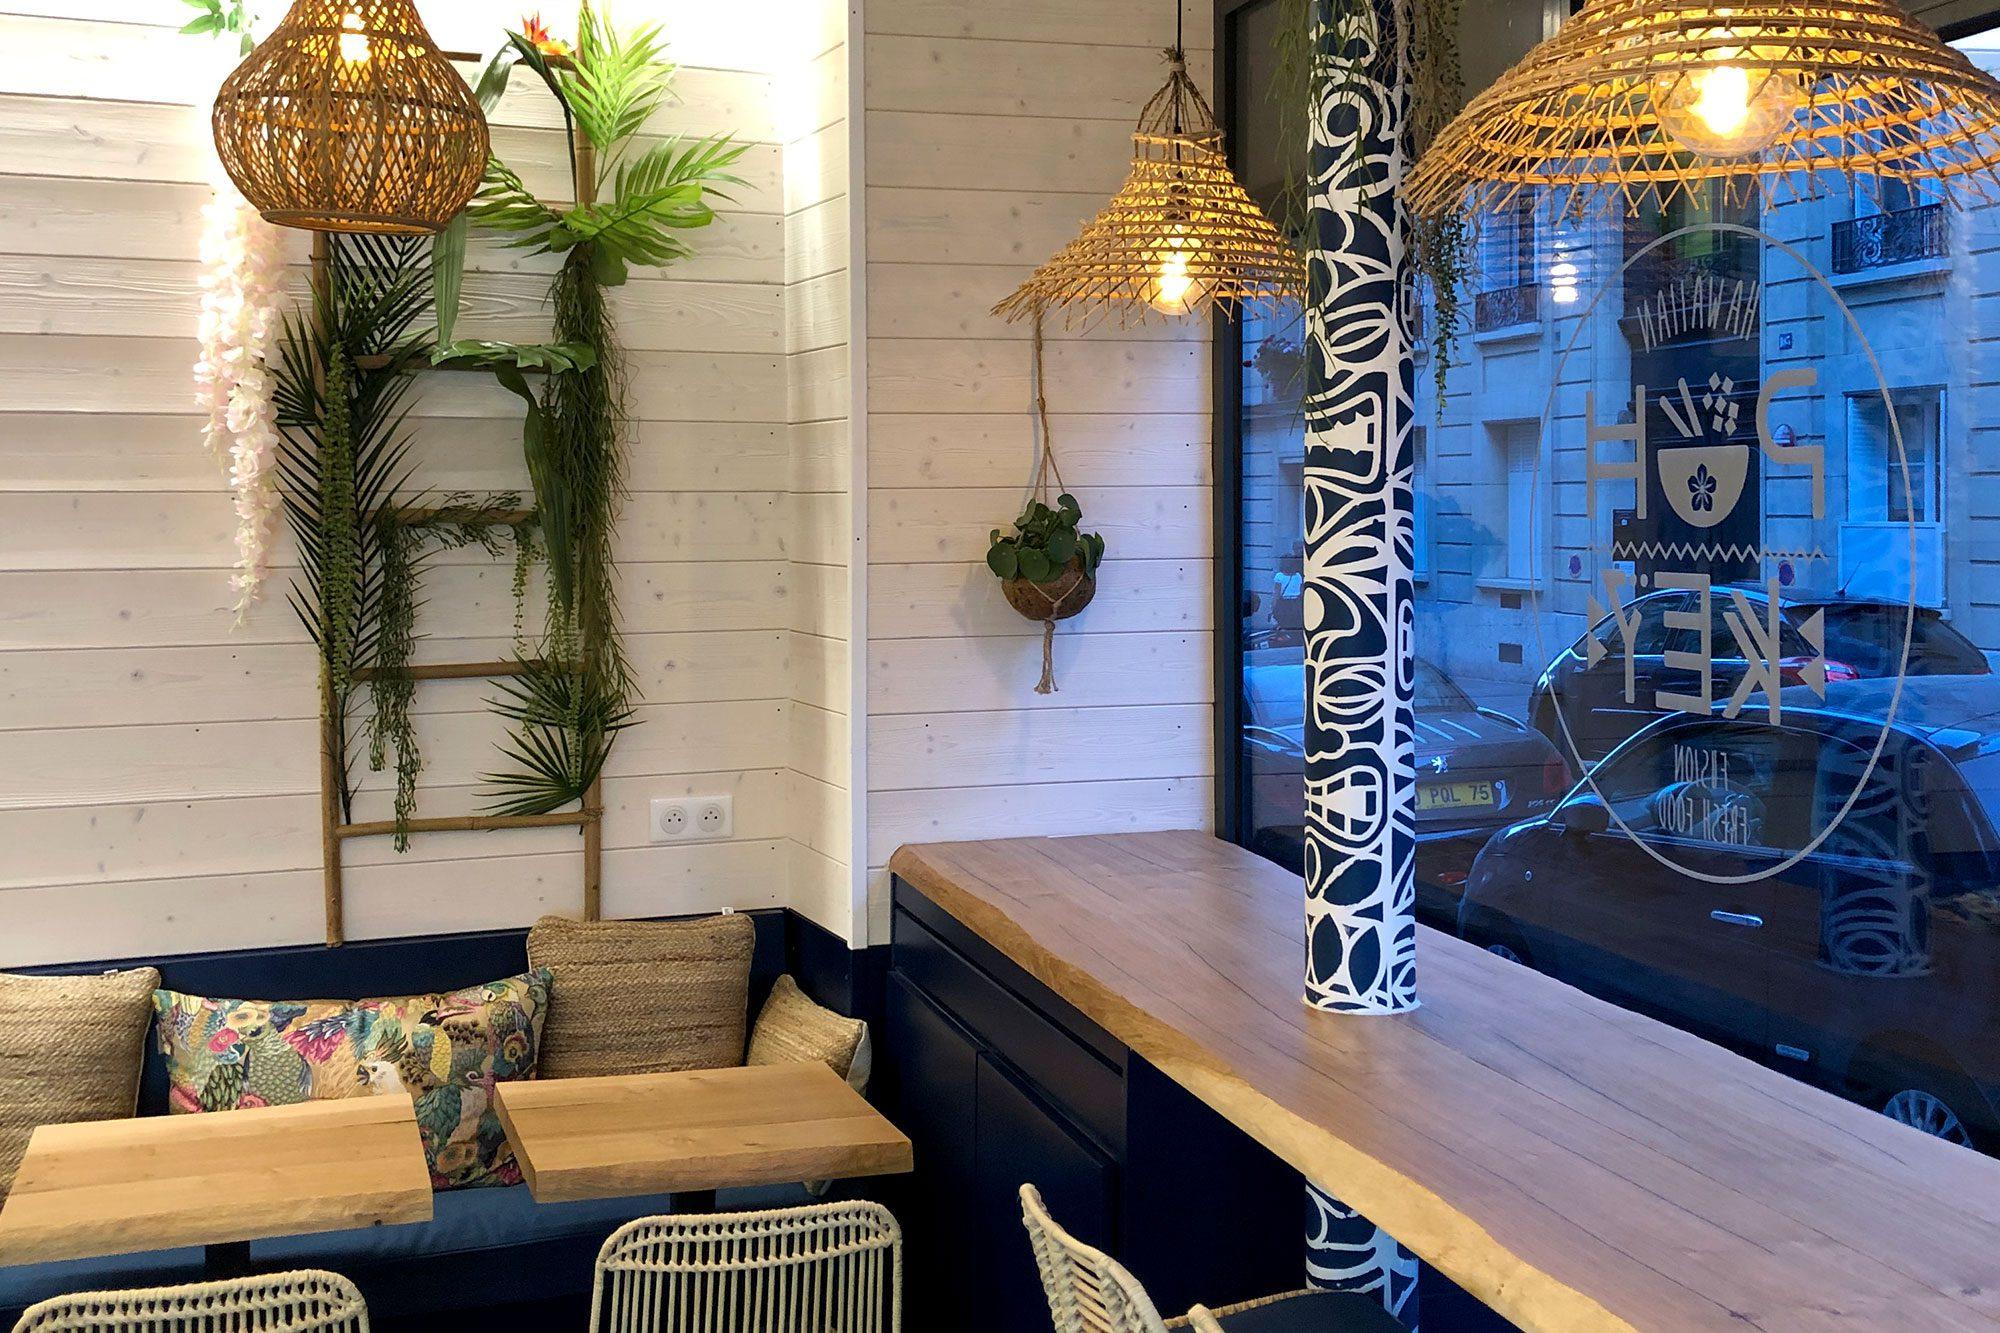 Poh Key Galerie Restaurant Deco 2